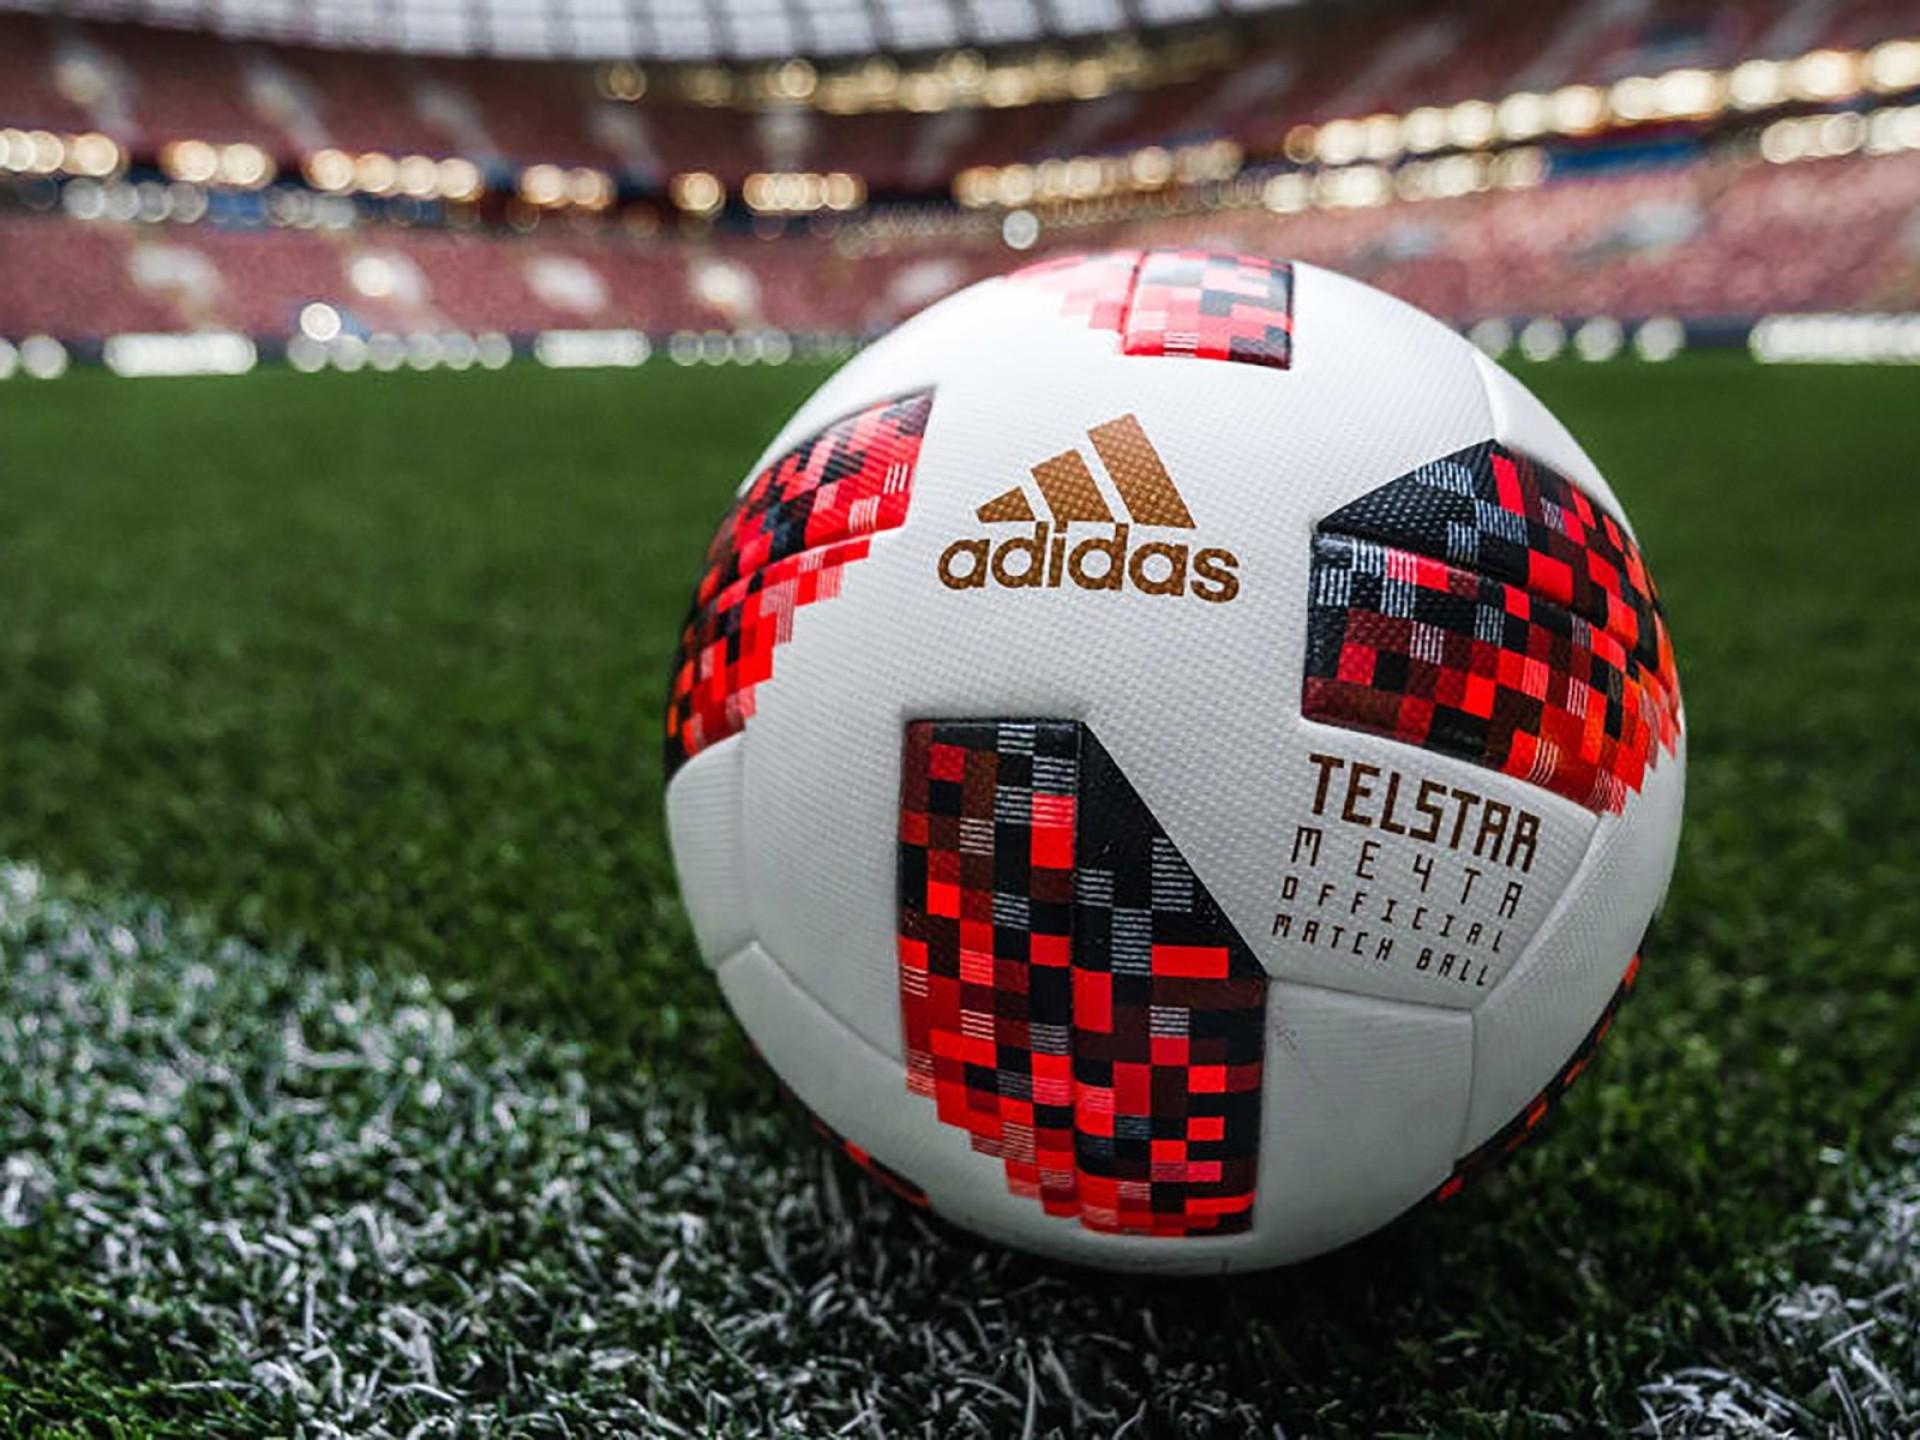 006 Soccer Vs Football Compare And Contrast Essay Fifa Ballitoka16rn Ju Excellent 1920